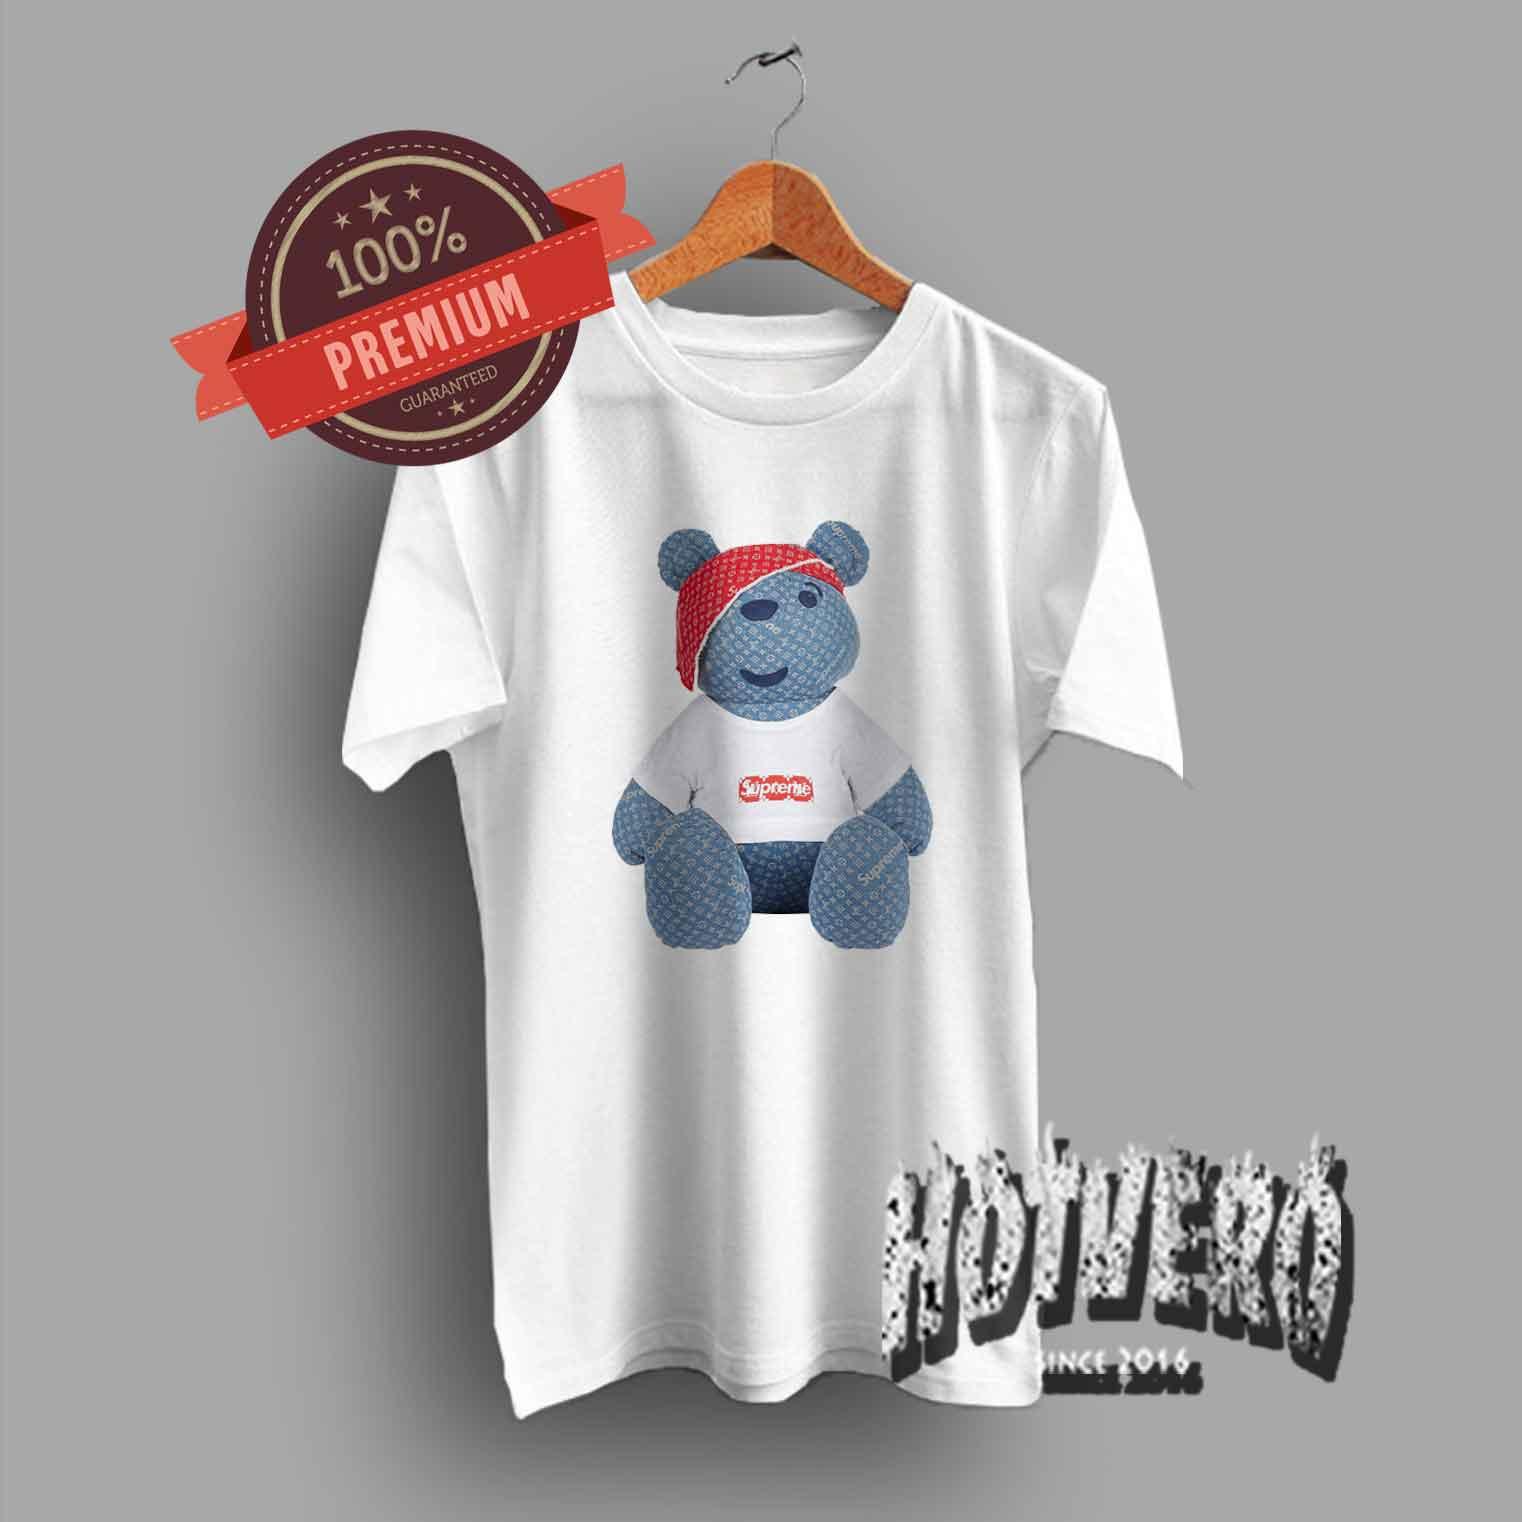 Cheap Supreme Pudsey Bear Urban T Shirt Collaboration - HotVero Com